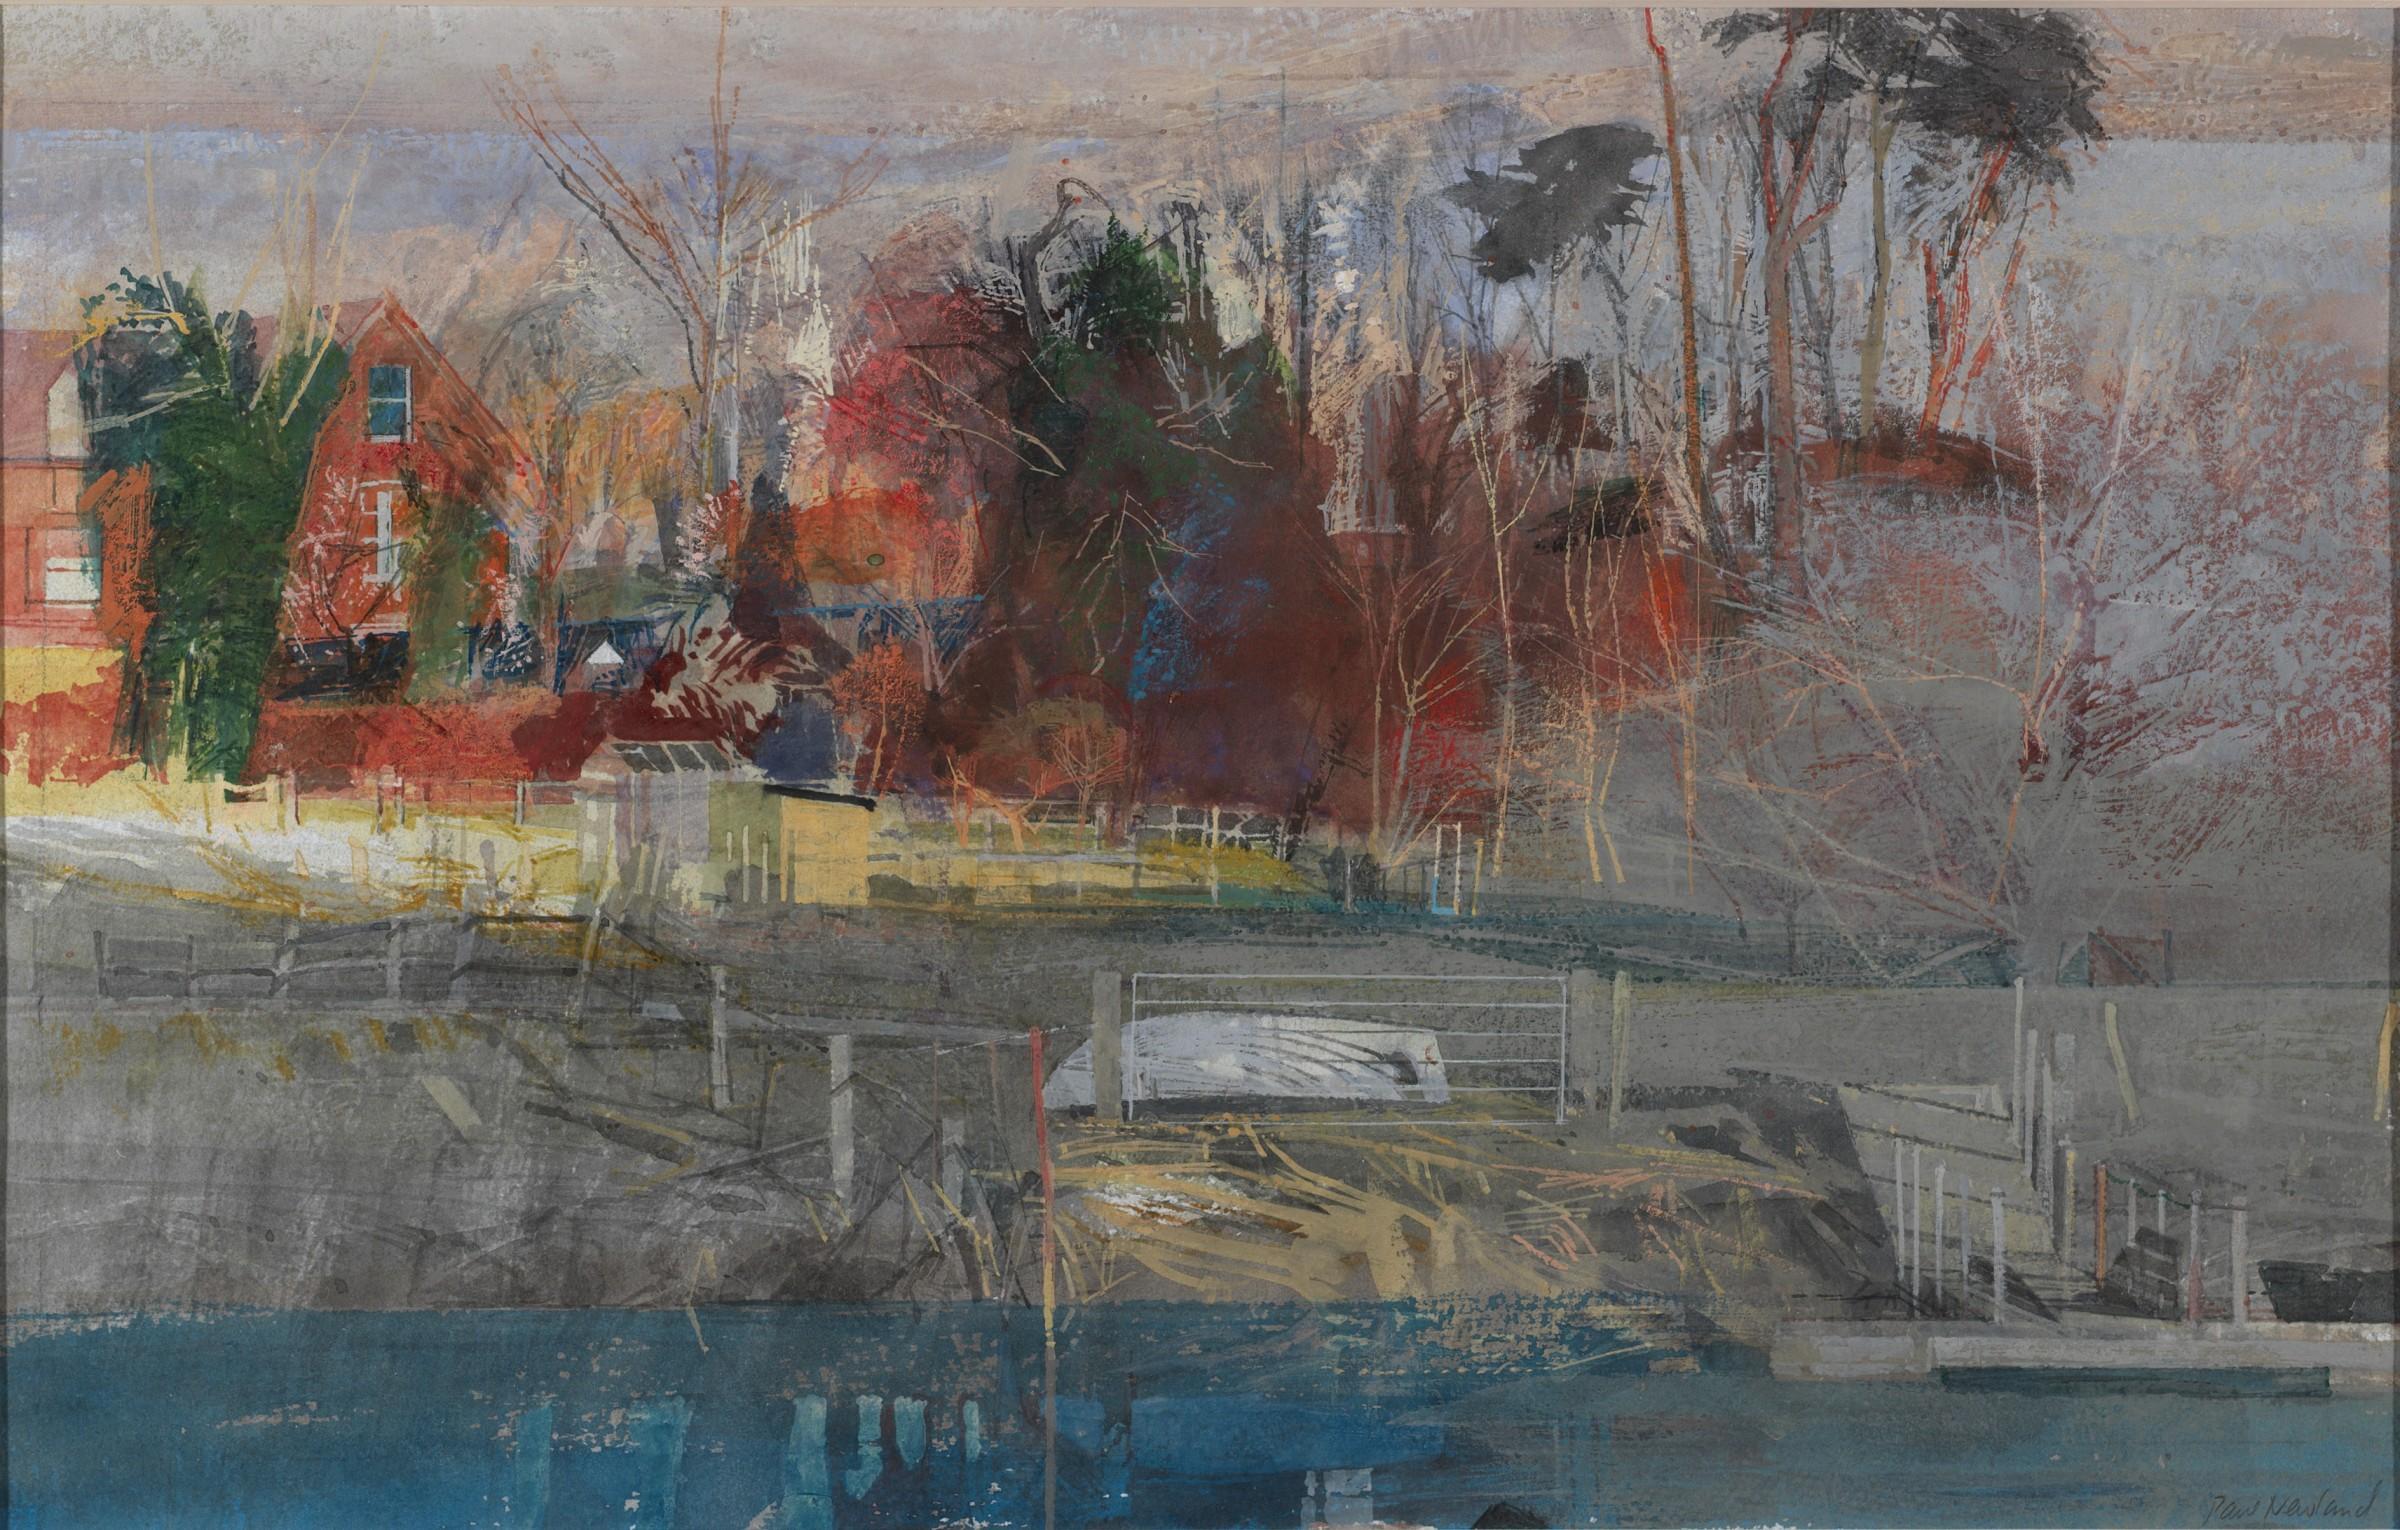 <span class=&#34;link fancybox-details-link&#34;><a href=&#34;/artists/87-paul-newland/works/10056-paul-newland-farm-by-the-river/&#34;>View Detail Page</a></span><div class=&#34;artist&#34;><span class=&#34;artist&#34;><strong>Paul Newland</strong></span></div><div class=&#34;title&#34;><em>Farm by the River</em></div><div class=&#34;medium&#34;>watercolour & gouache</div>